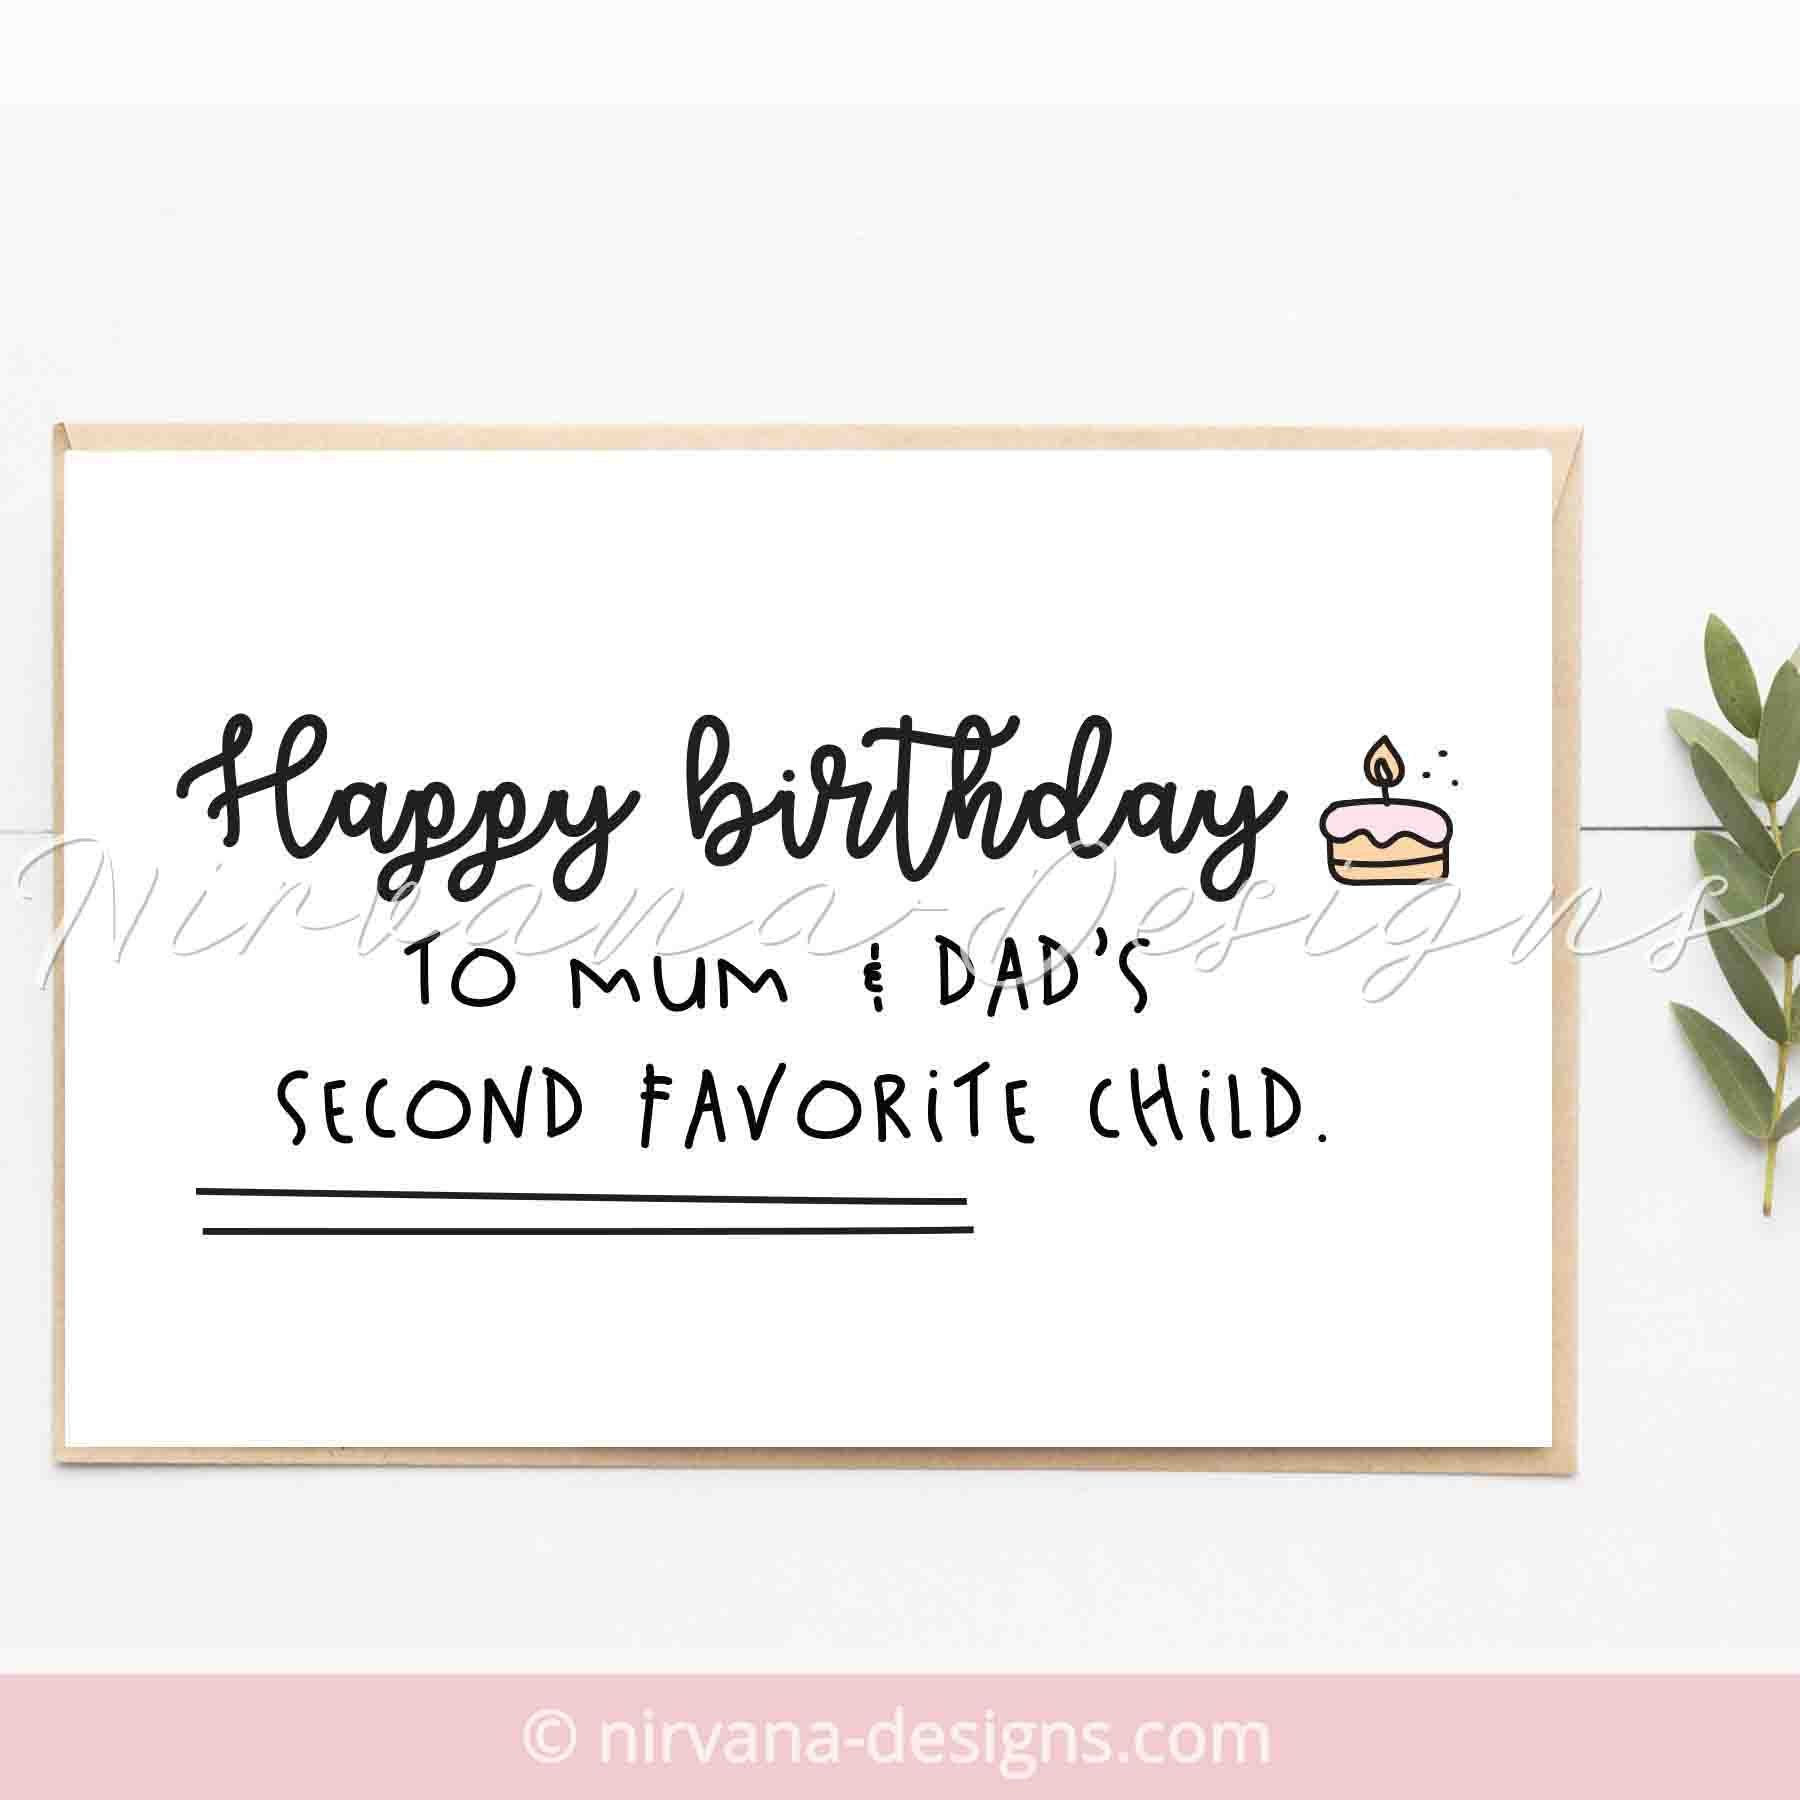 Brother Birthday Card Funny Happy Birthday Cards For Sister Sarcastic Birthday C Birthday Cards For Brother Birthday Gifts For Brother Happy Birthday Brother